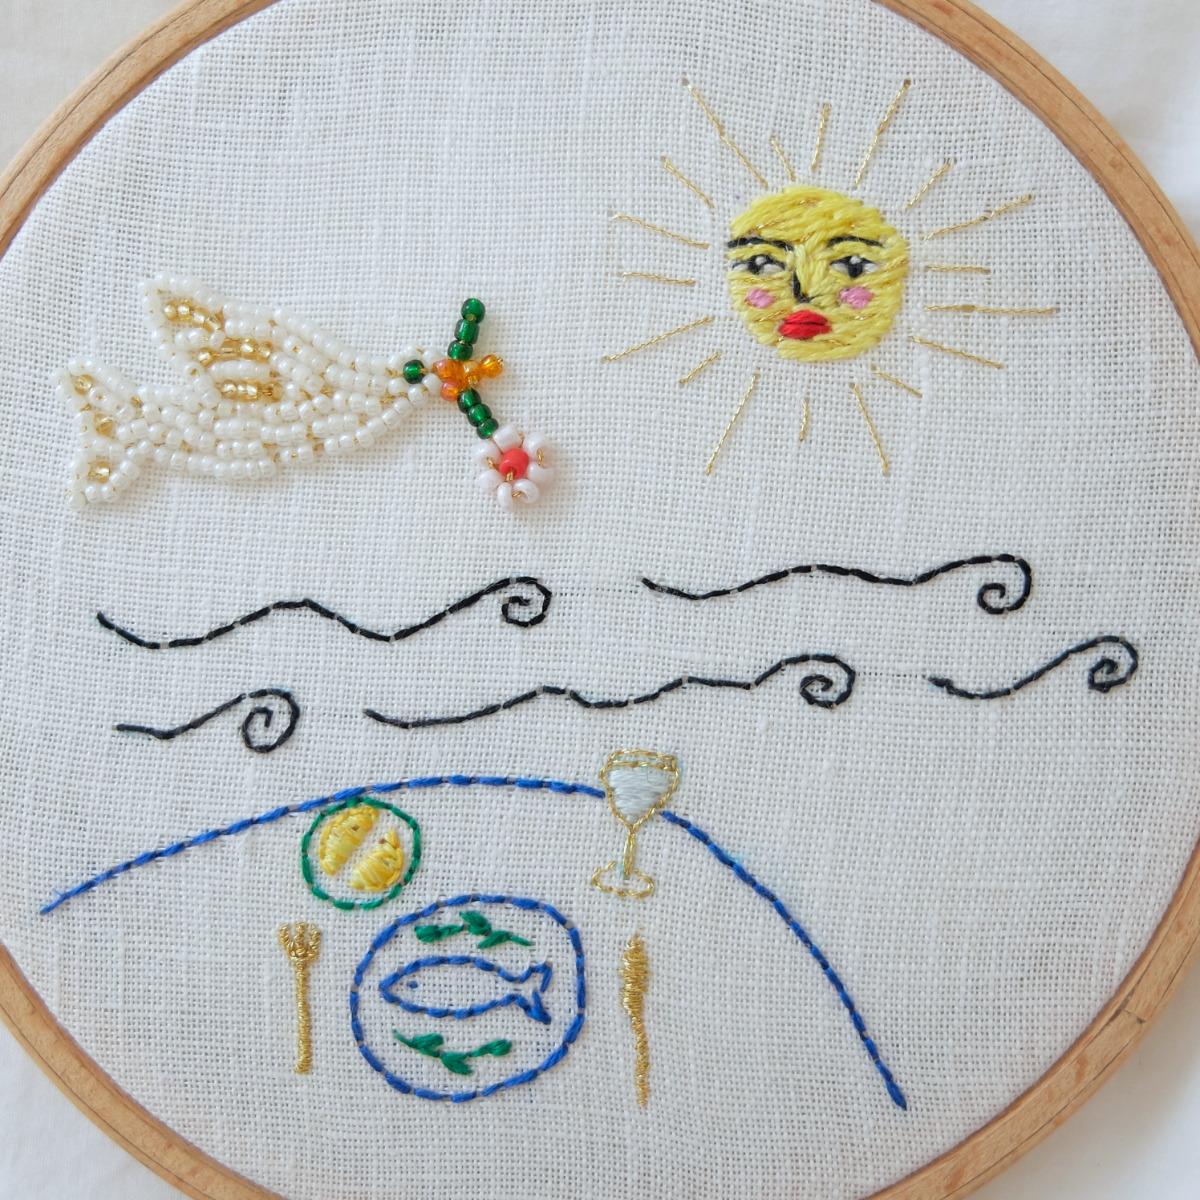 Life in the atlantique hoop detail 2